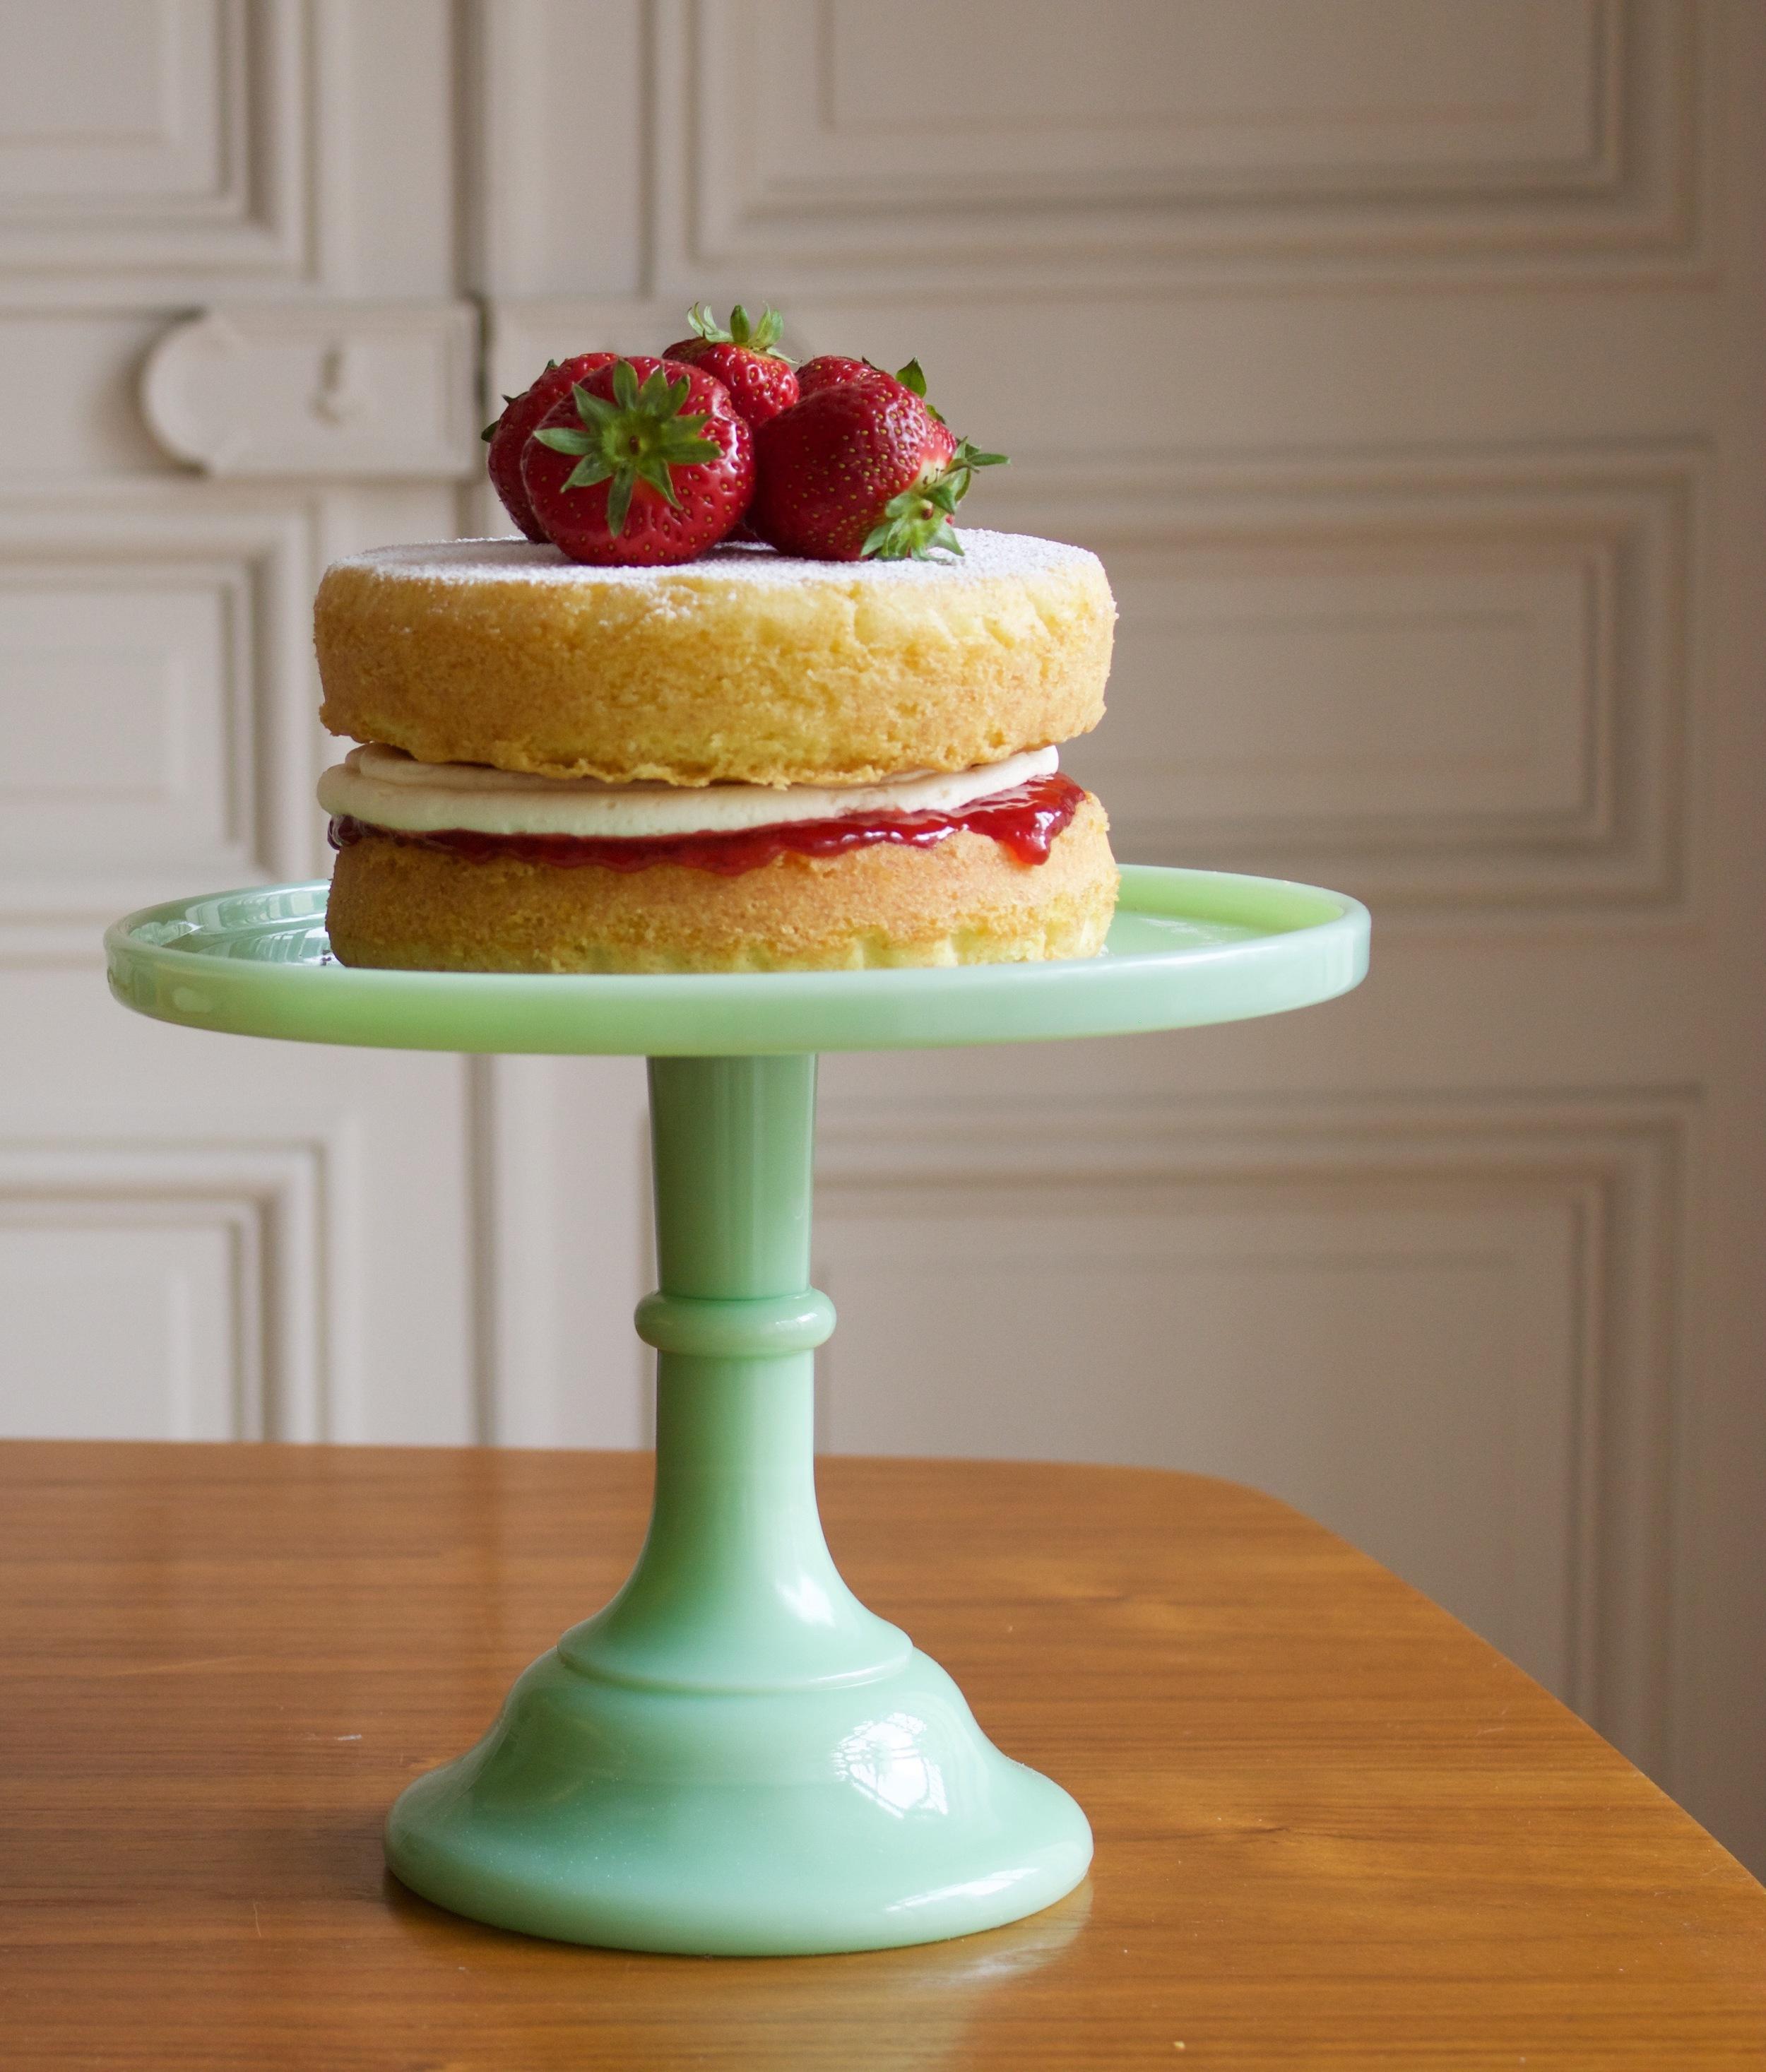 Victoria Sponge Cake with strawberry jam.